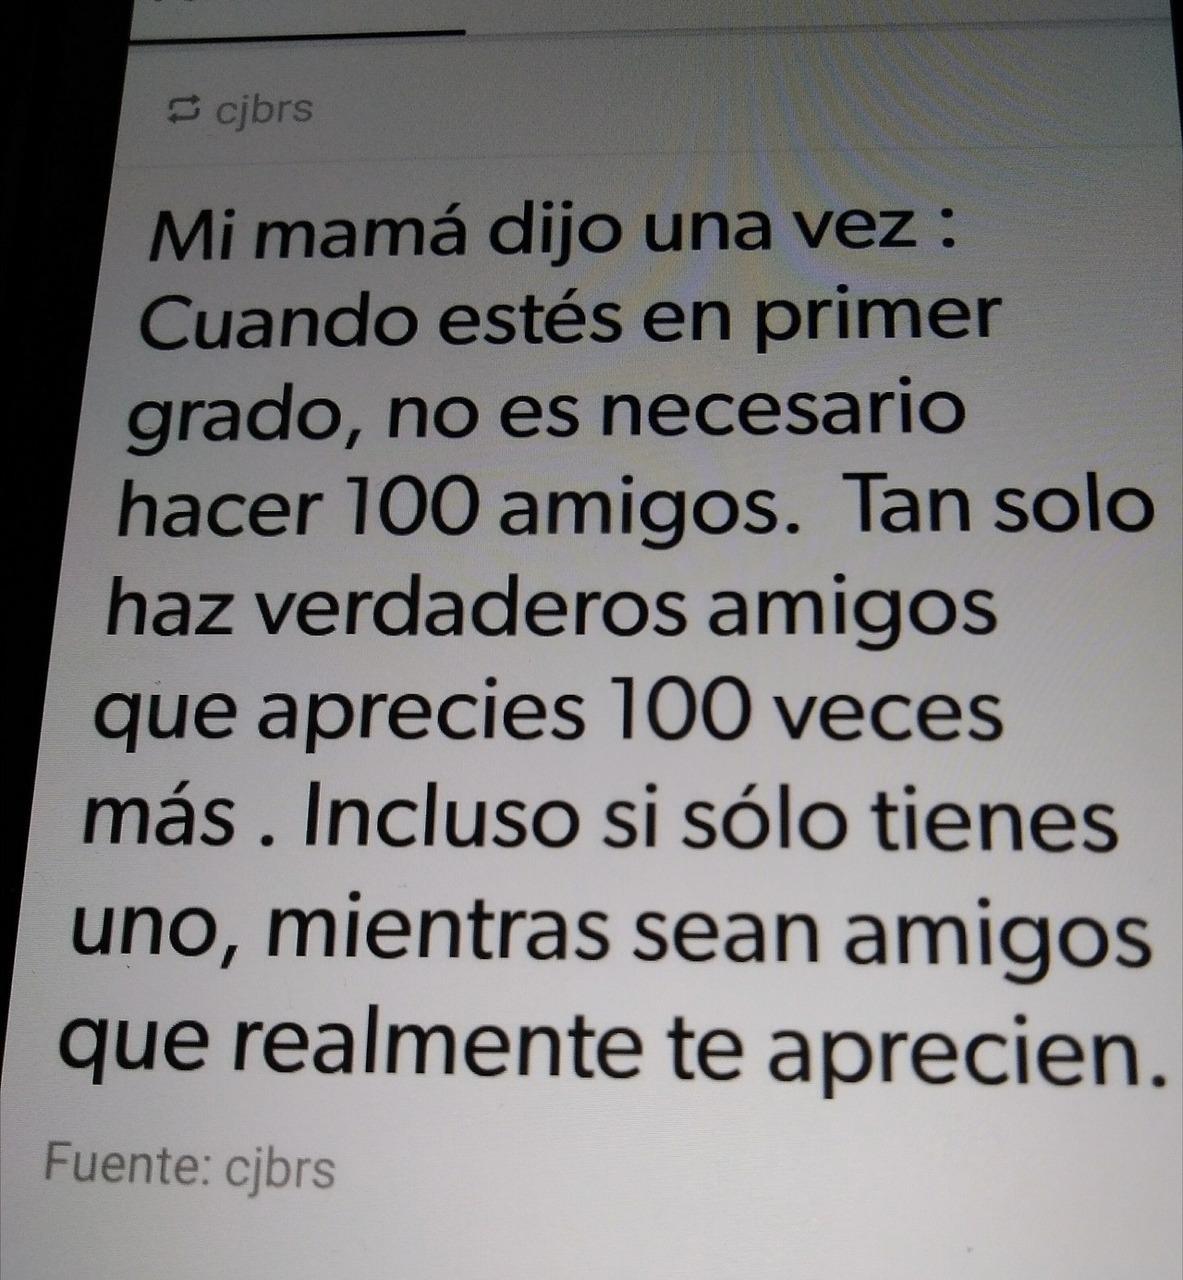 Image About Tumblr In Citas Y Texto By Odarli Gutierrez